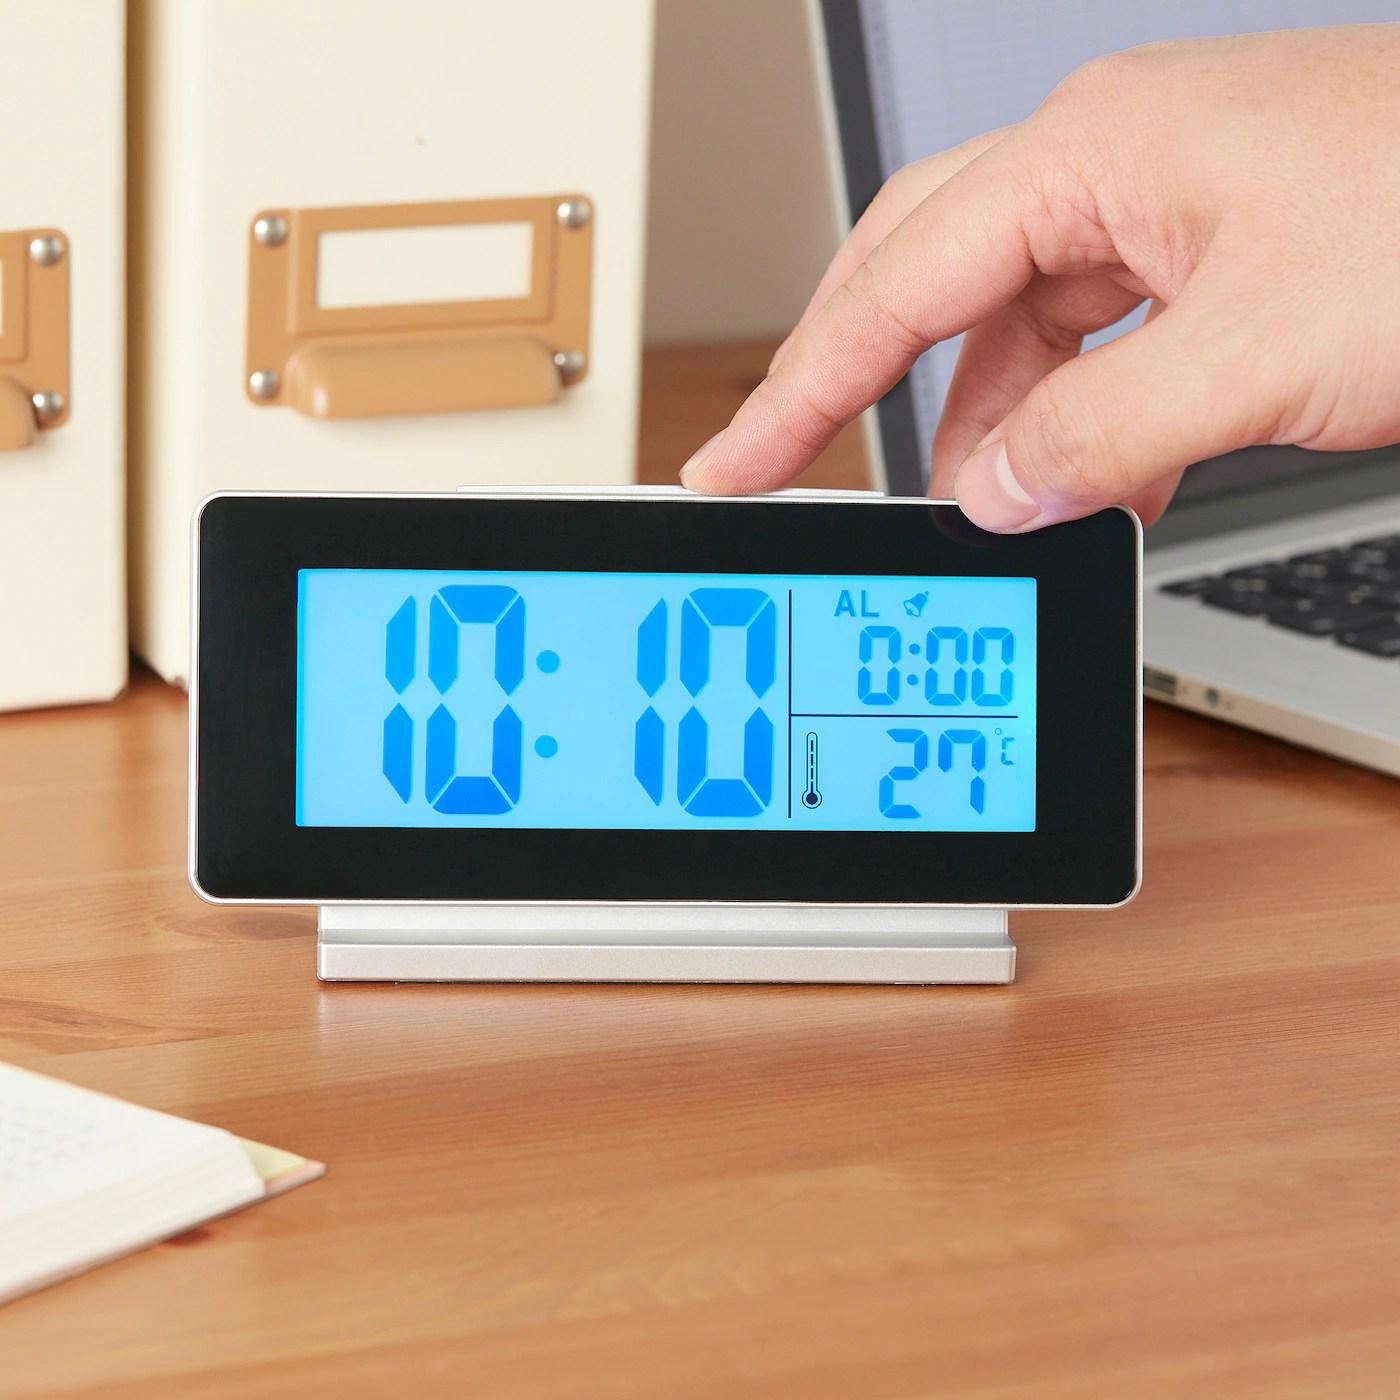 Filmis Horloge Thermometre Reveil Noir Ikea